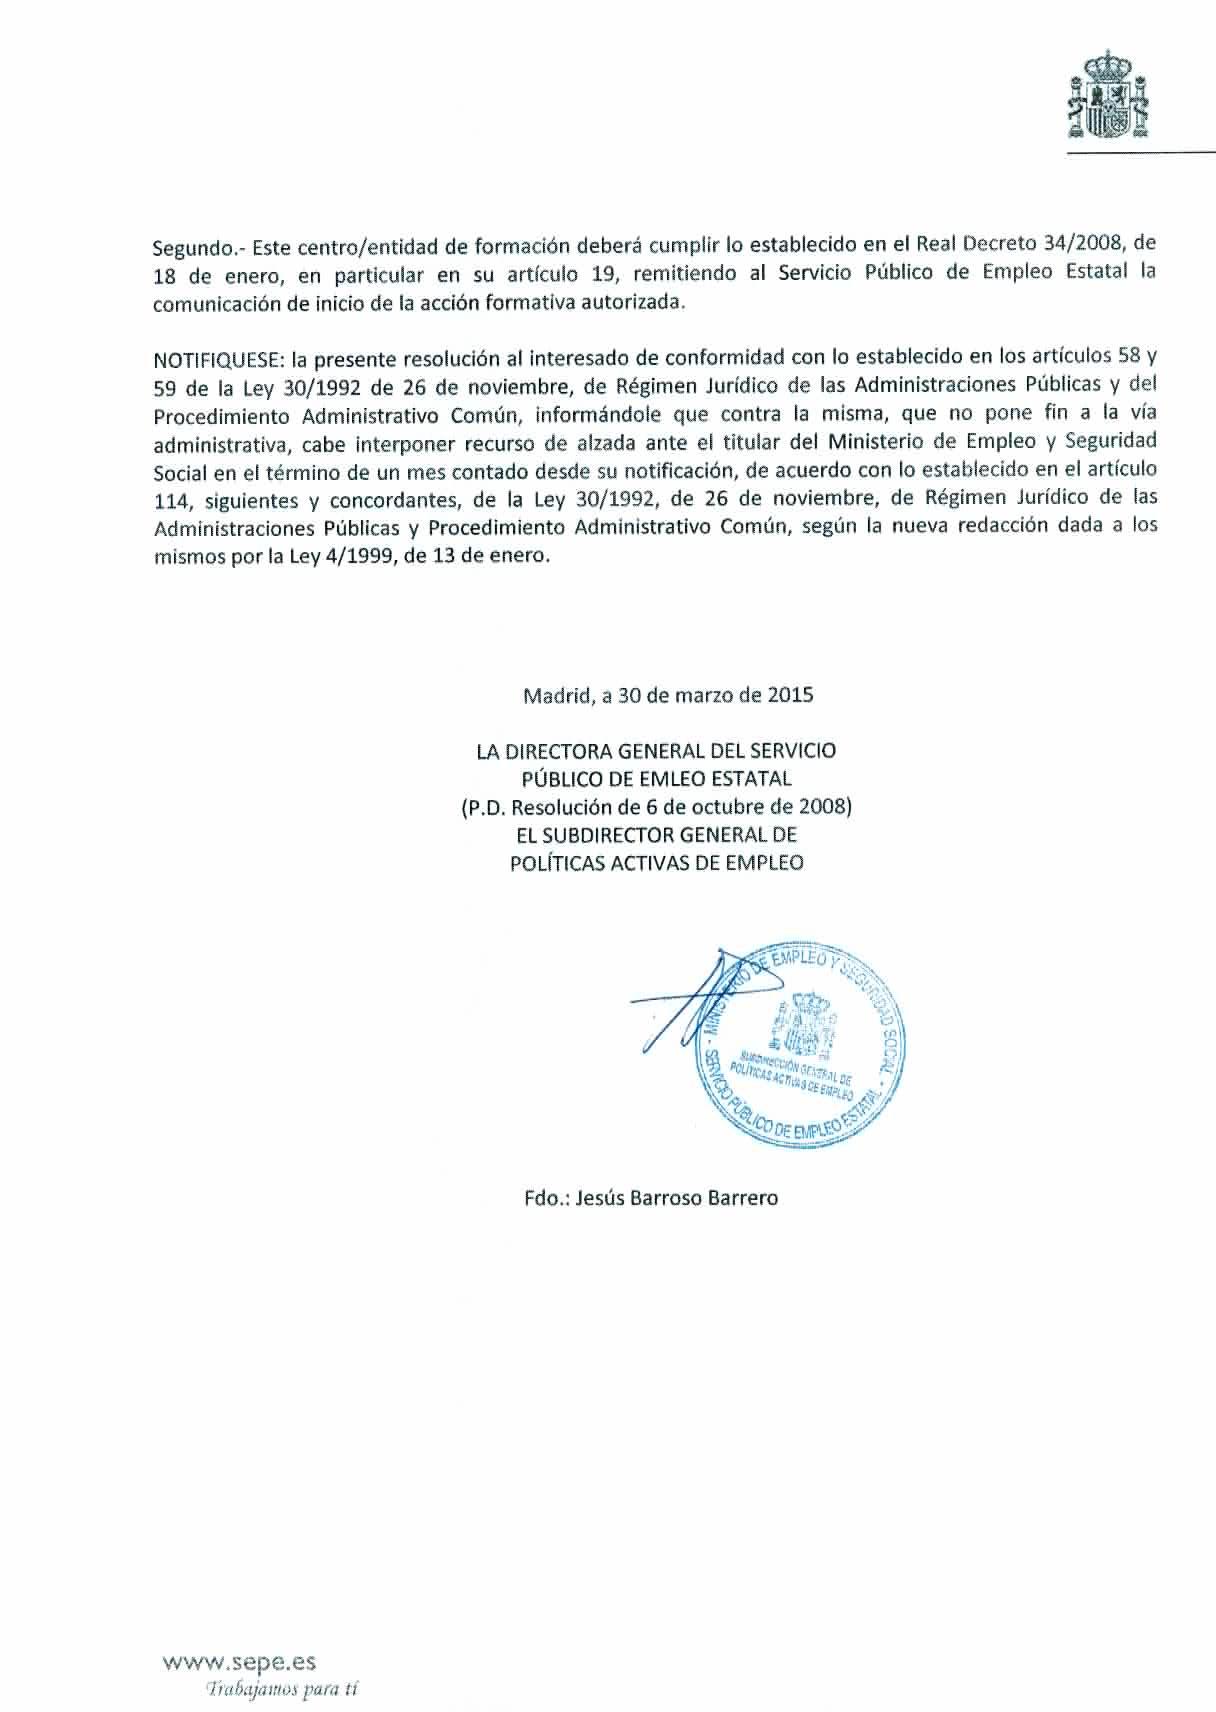 resolucion_sepe_autorizacion_SSCS0208_MF1016_2_Página_2